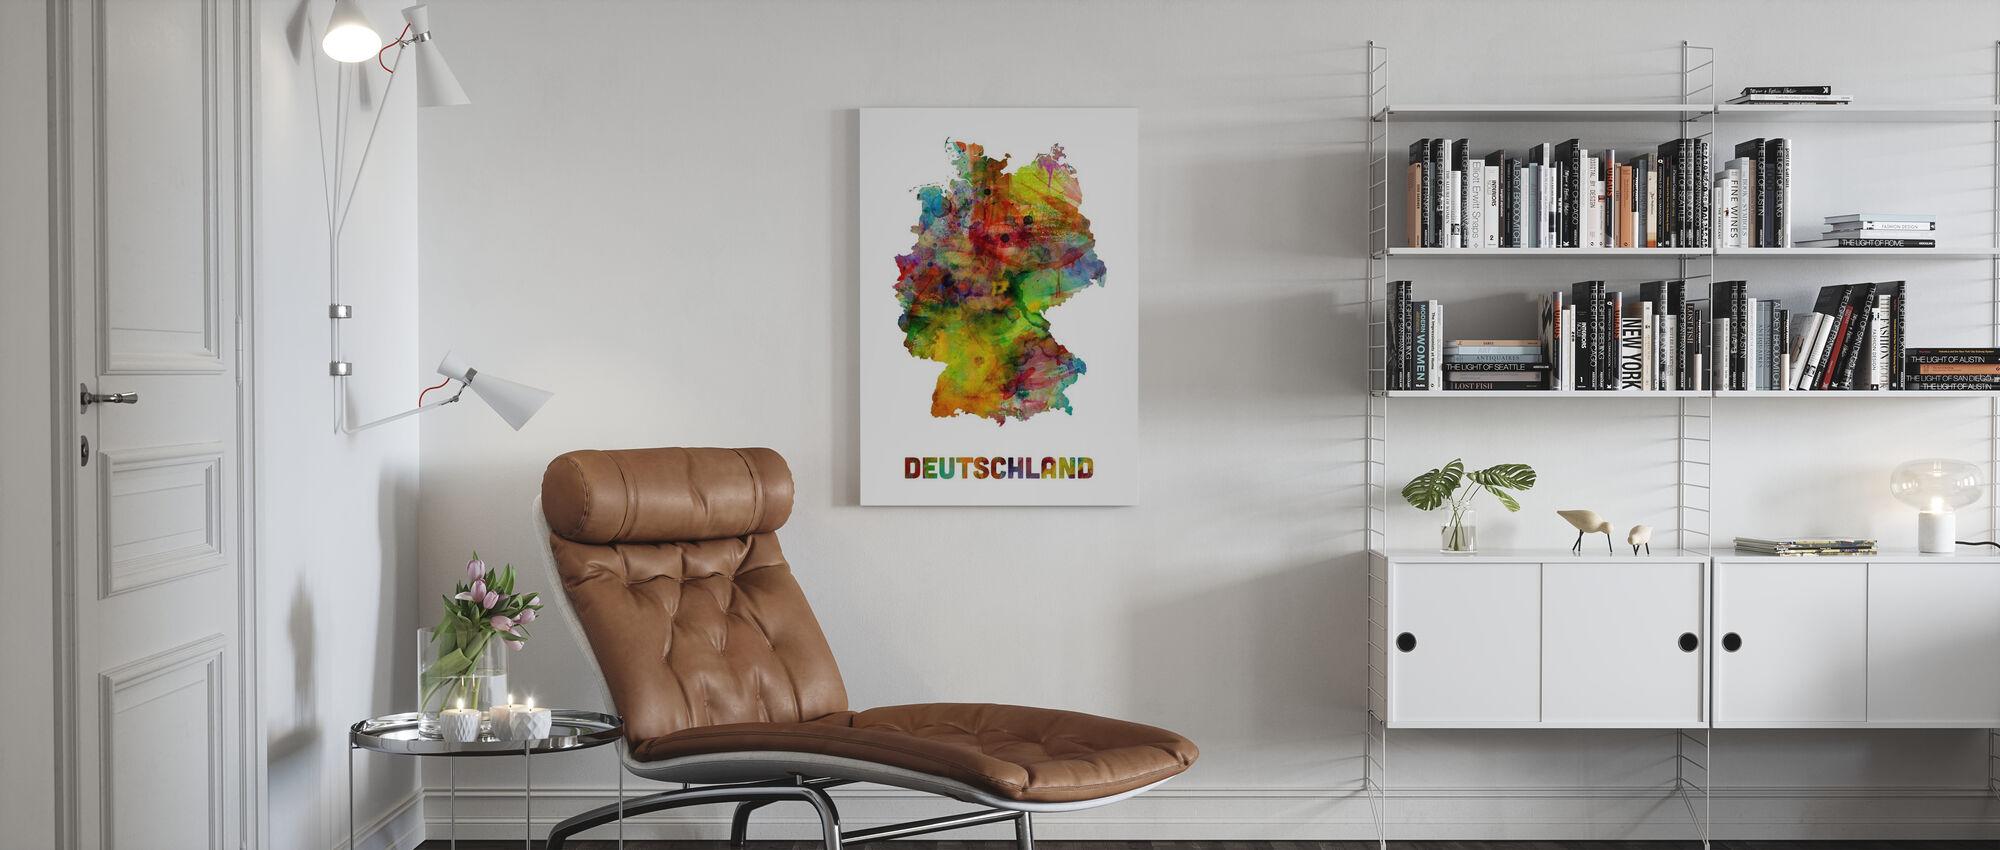 Tyskland Akvarell Karta - Canvastavla - Vardagsrum